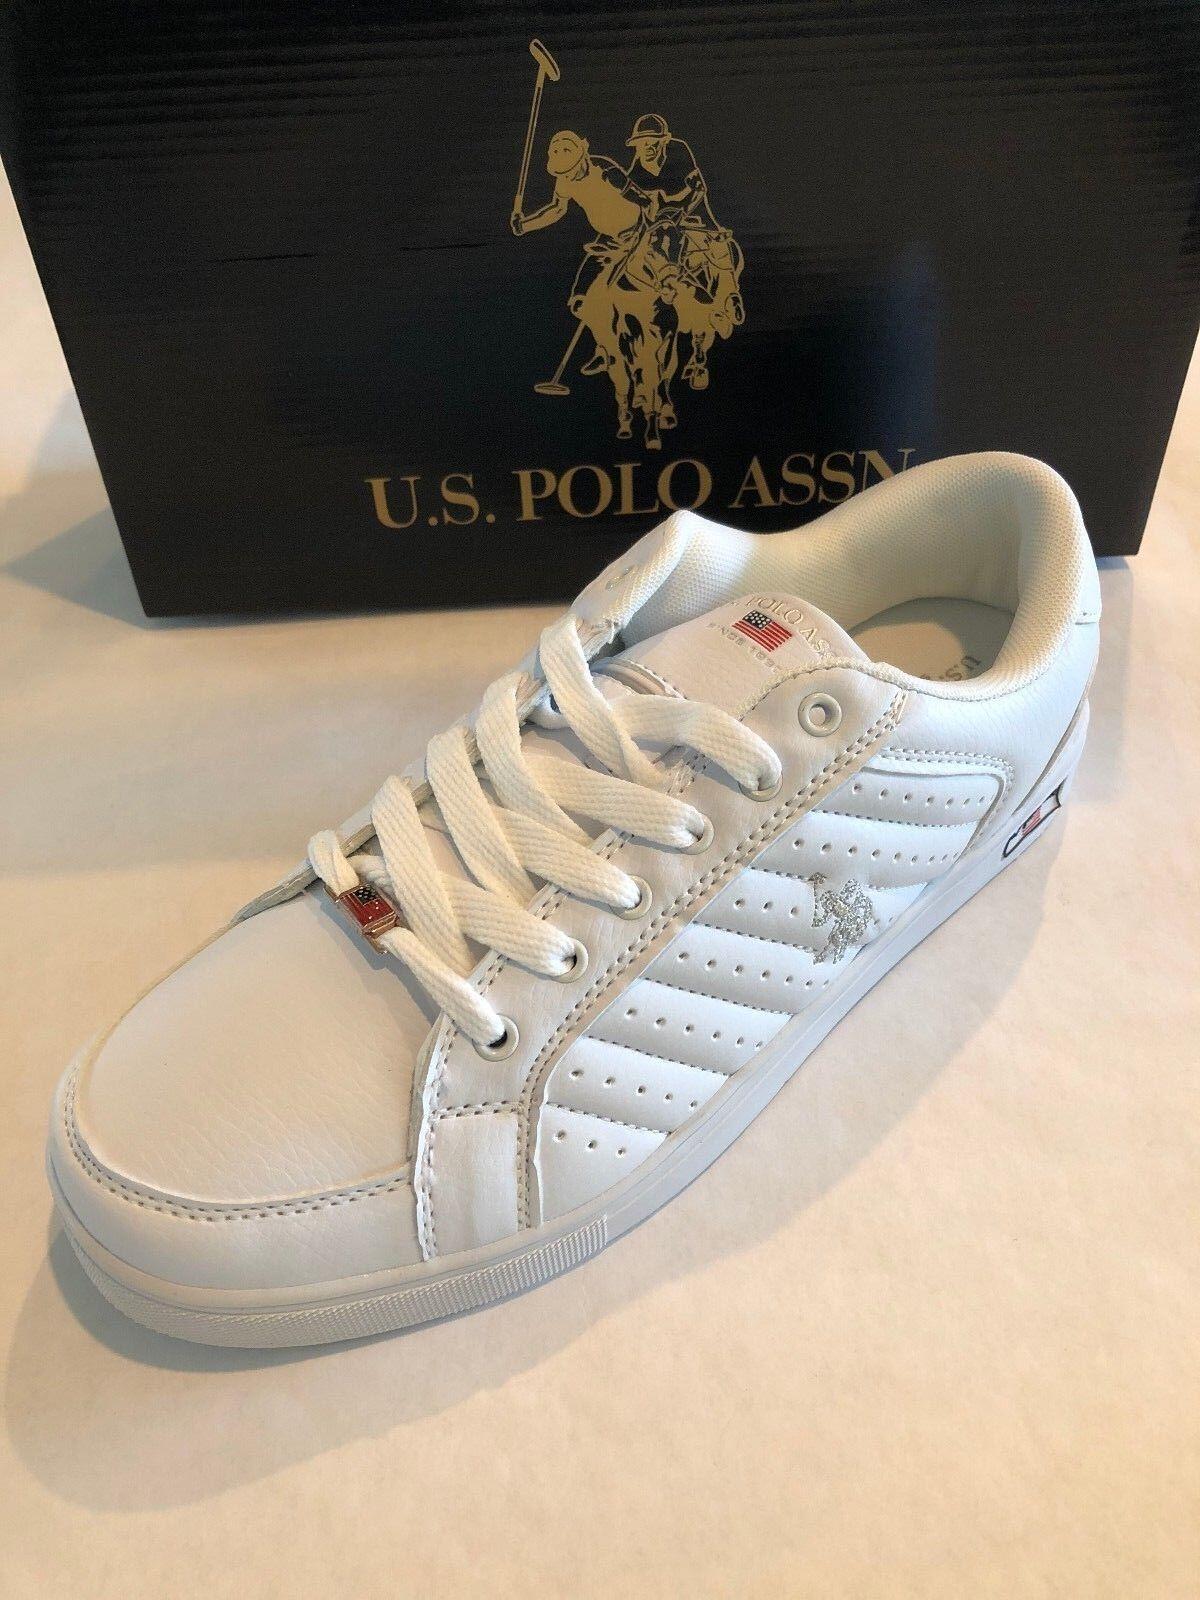 5dc346b7fe1b US Polo Time X X X 217067 18W Man Shoes White Silver 4e5988 - buckle ...